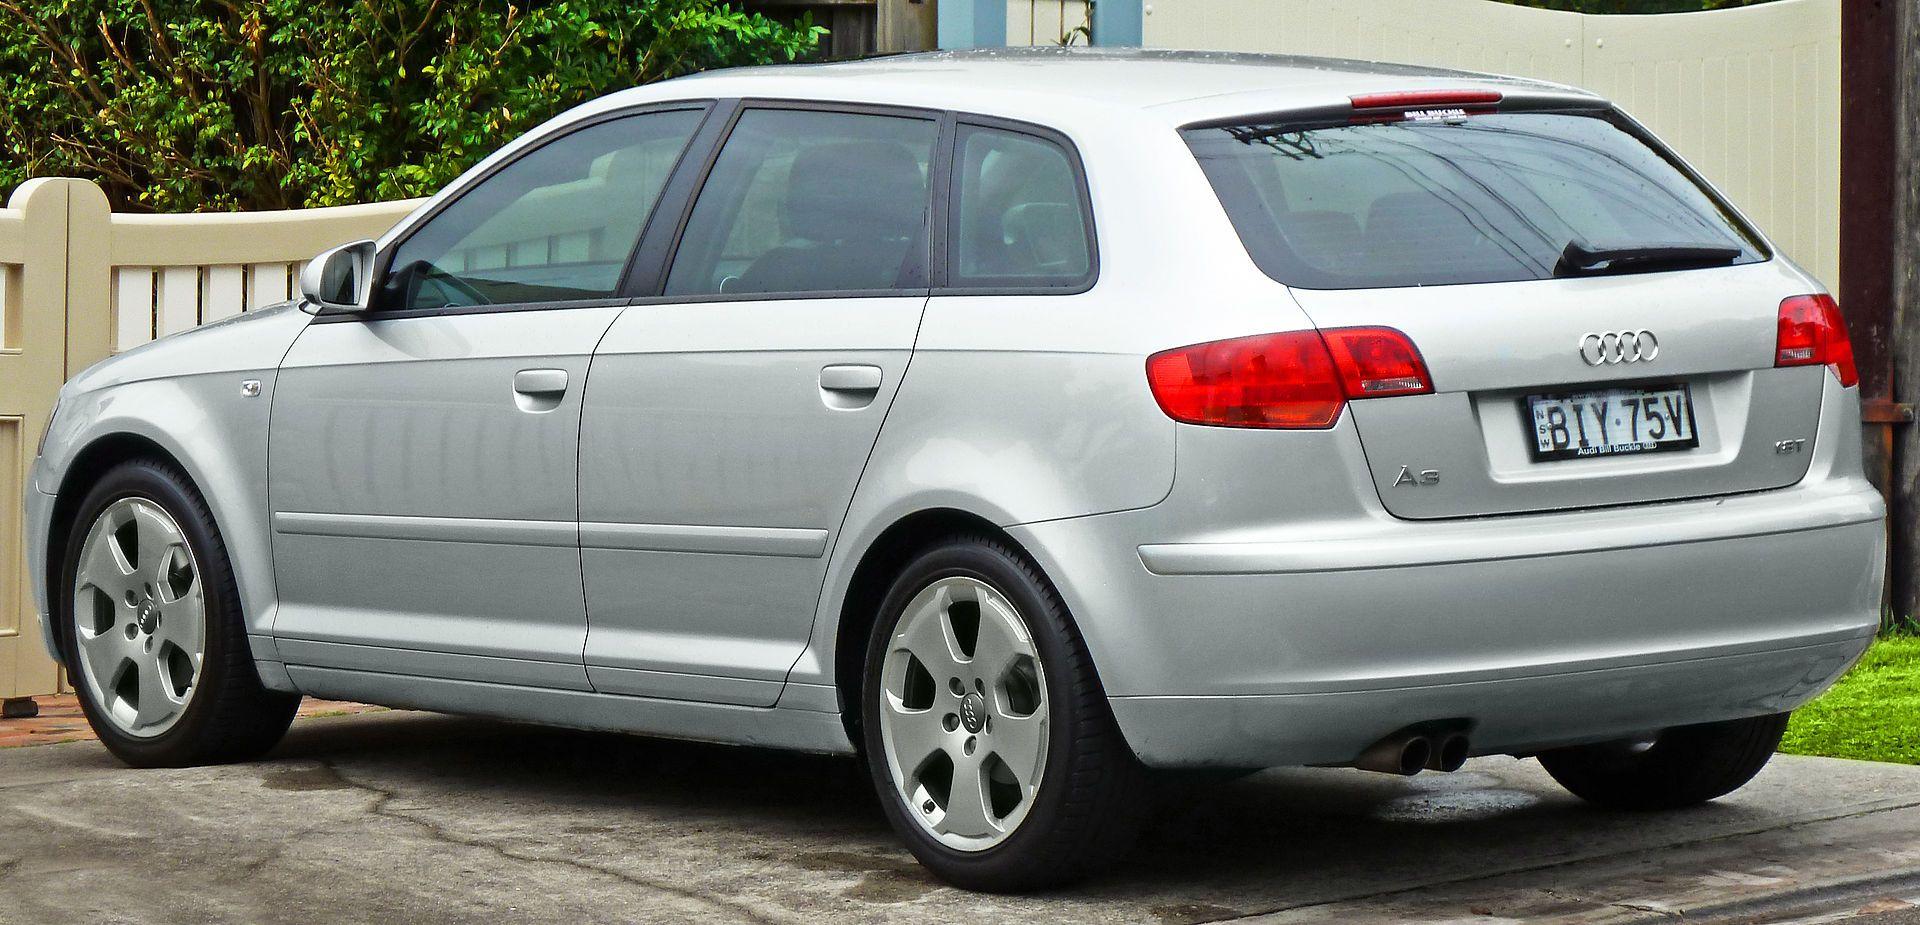 2005 2008 Audi A3 8pa 1 8 Tfsi 5 Door Sportback 2011 07 17 Audi A3 Wikipedia Audi A3 Audi Suv